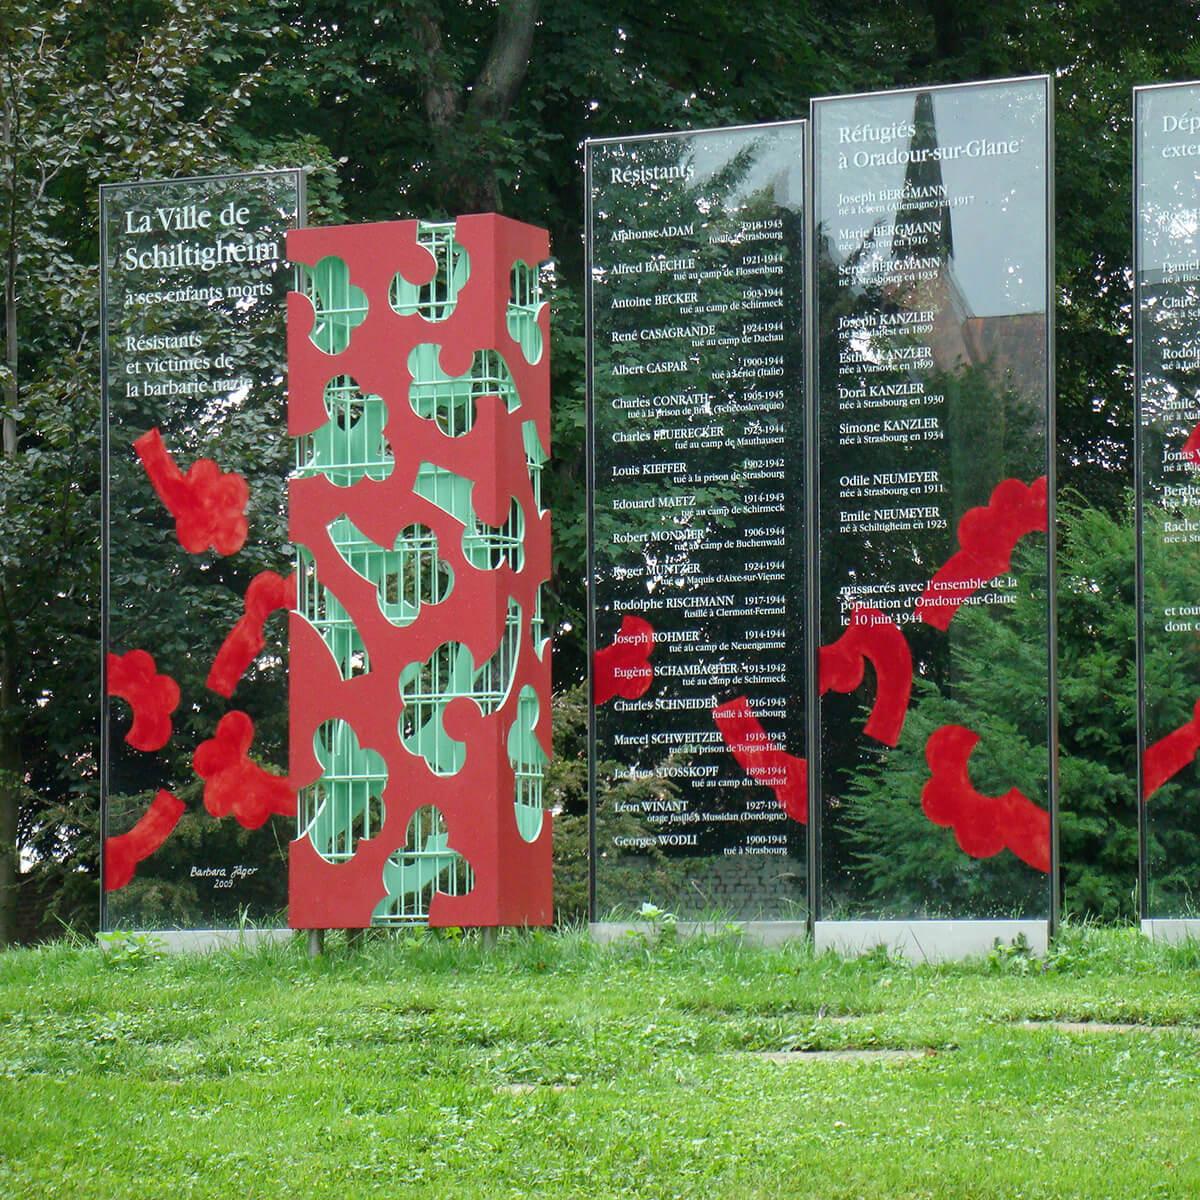 Barbara Jäger Malerei Skulptur Karlsruhe Widerstandsdenkmal Schiltigheim Stele de la Resistance